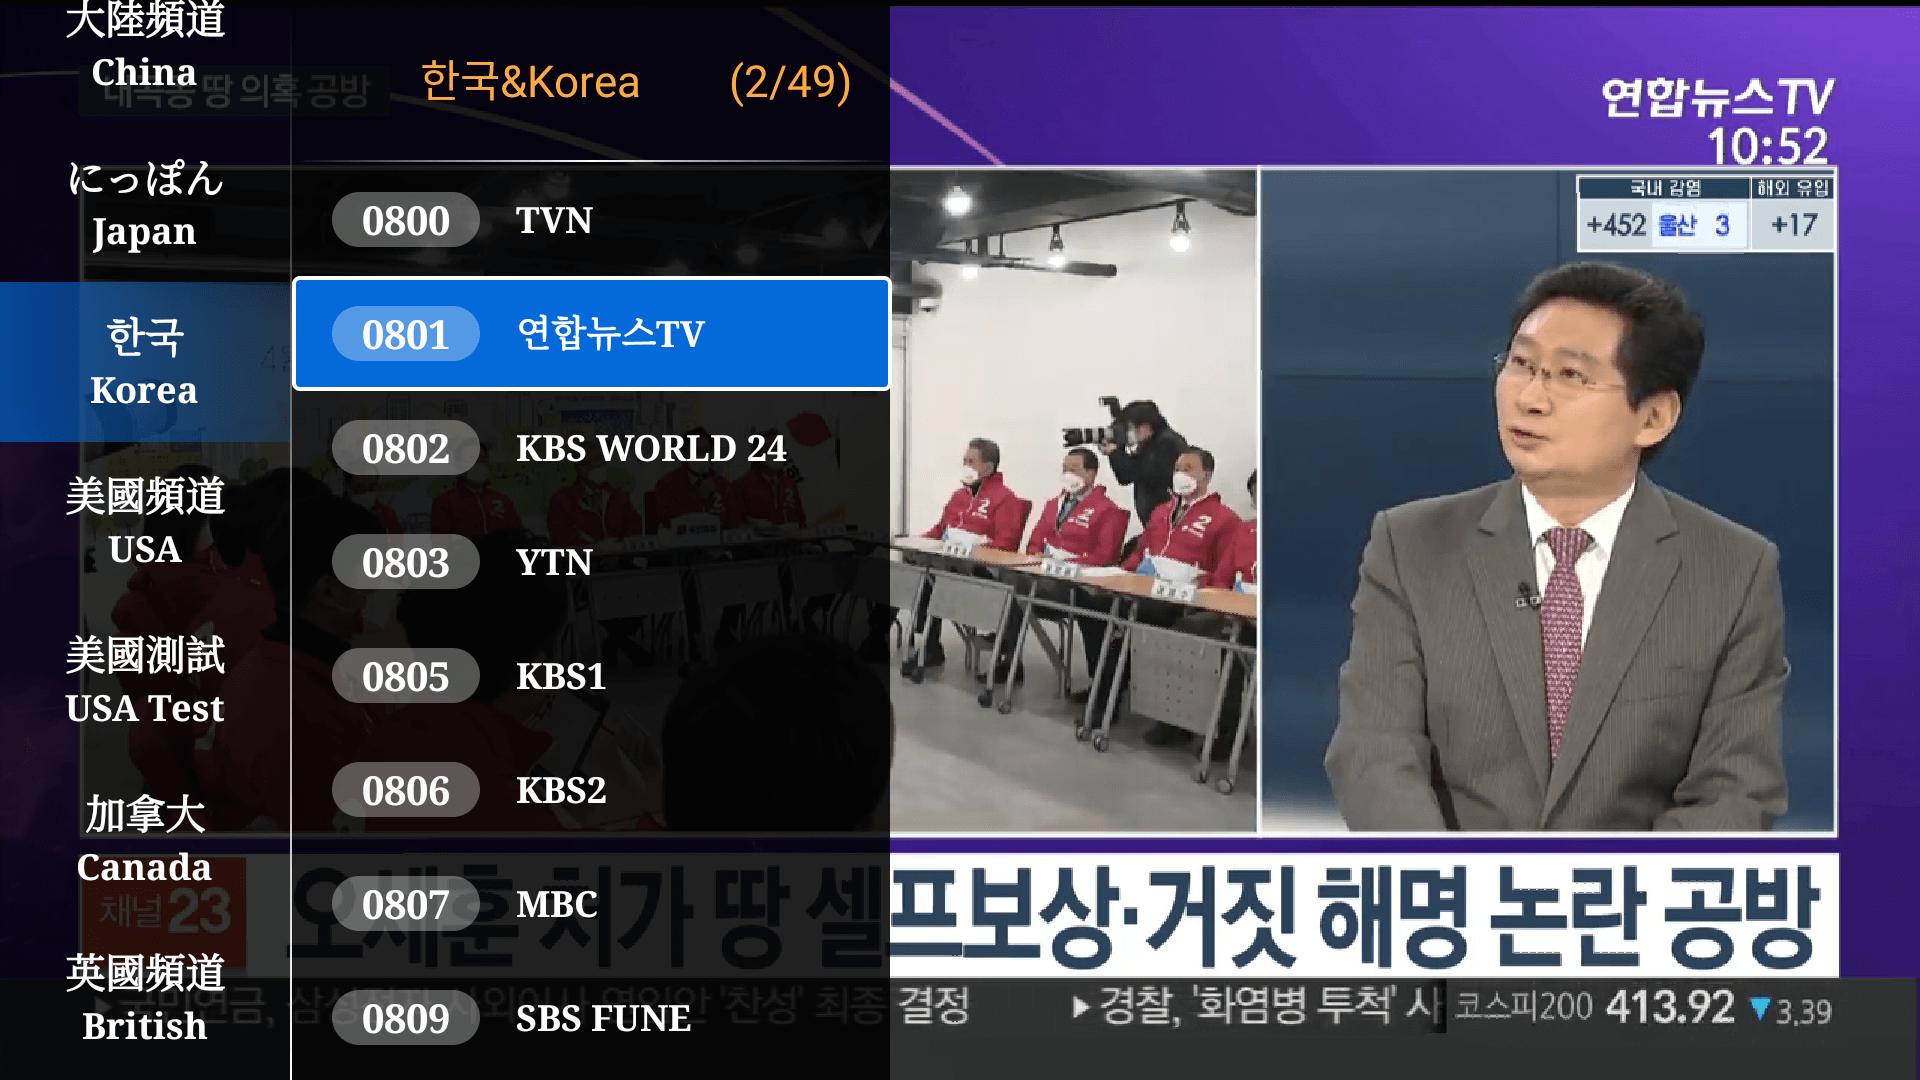 Japanese live TV/Korean live TV